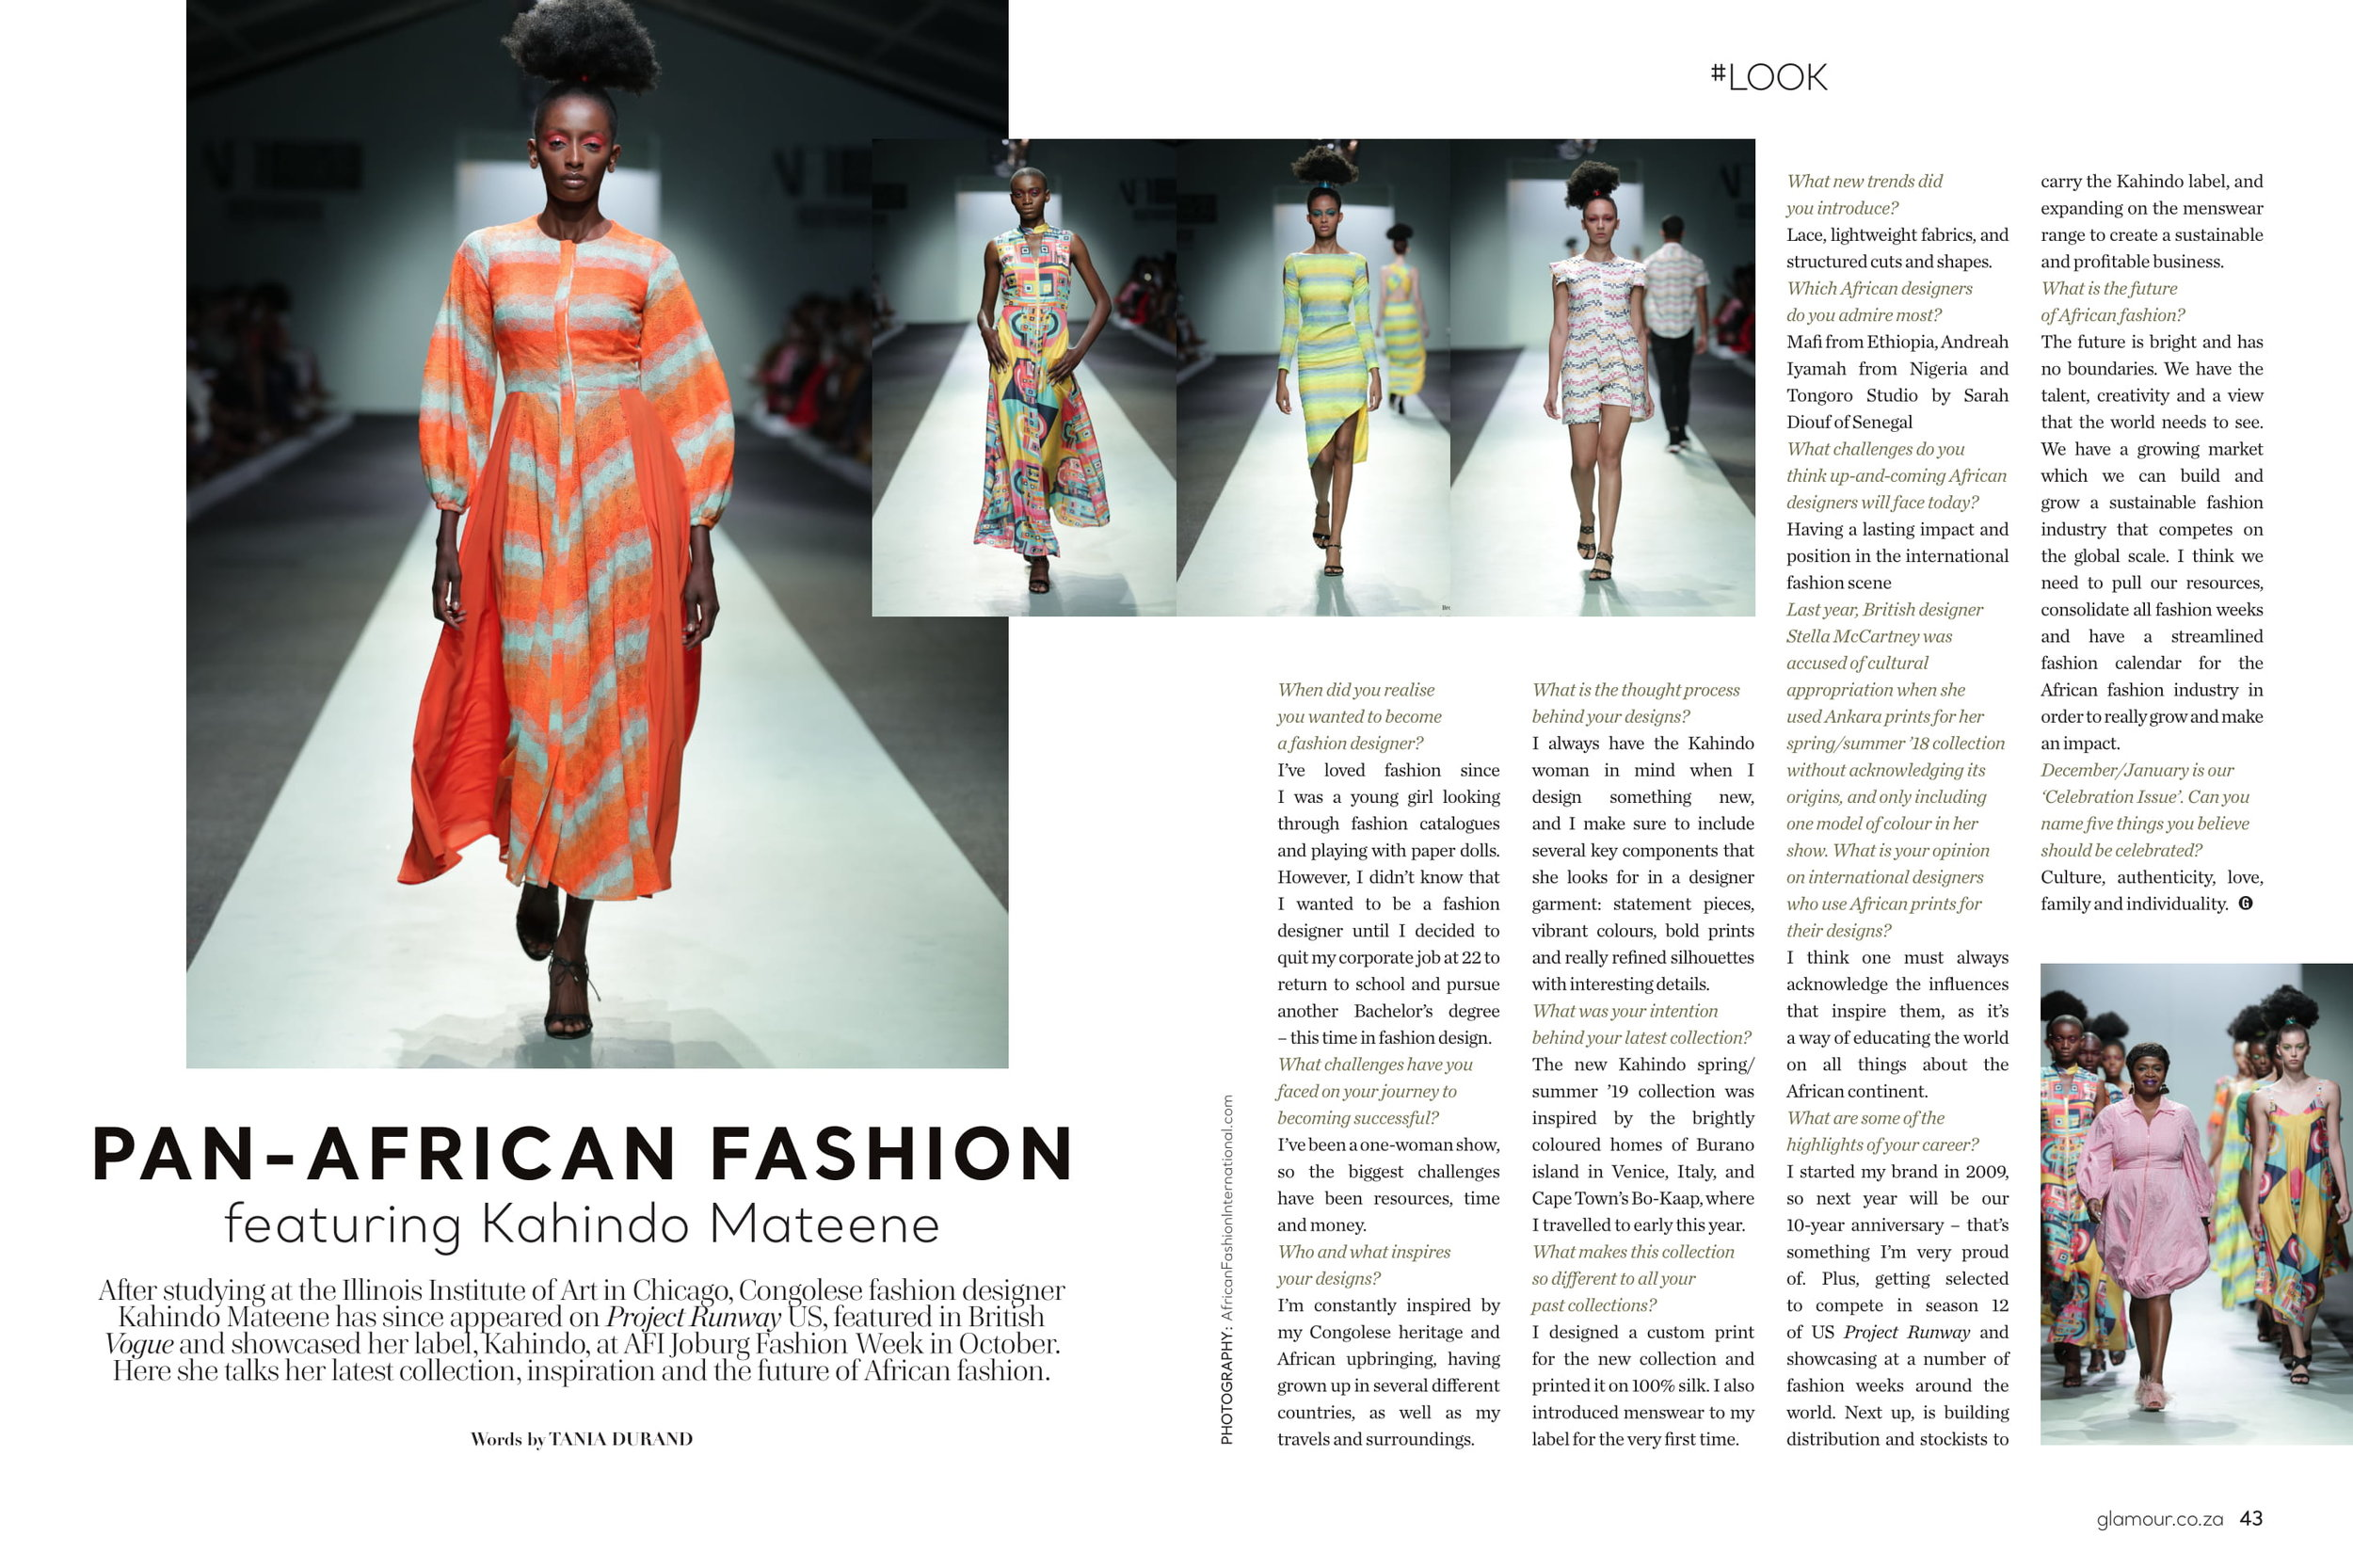 LOOK - Pan African Fashion-1.jpg